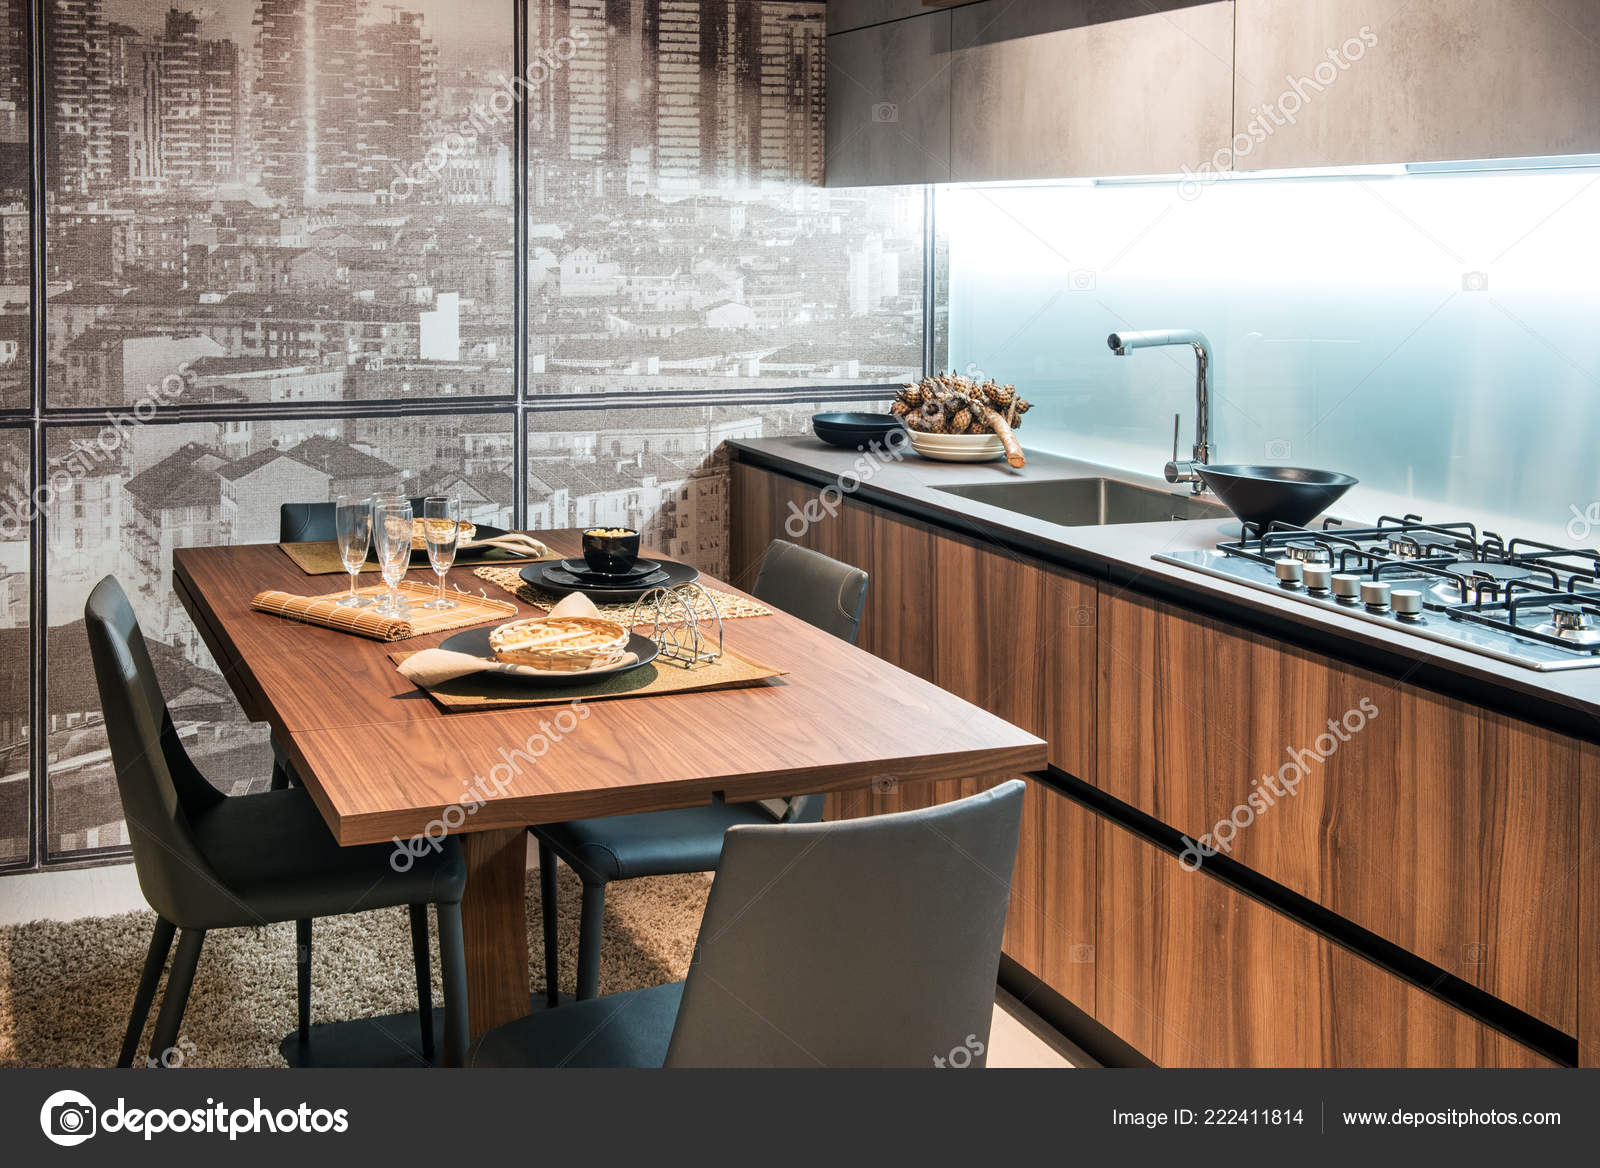 rustic kitchen sinks engineered wood flooring 现代化的厨房配有木质橱柜餐具和可俯瞰城市的玻璃墙 图库照片 现代化的厨房配有木质橱柜 水槽 餐桌 餐具和可俯瞰城市的玻璃墙 照片作者photology1971